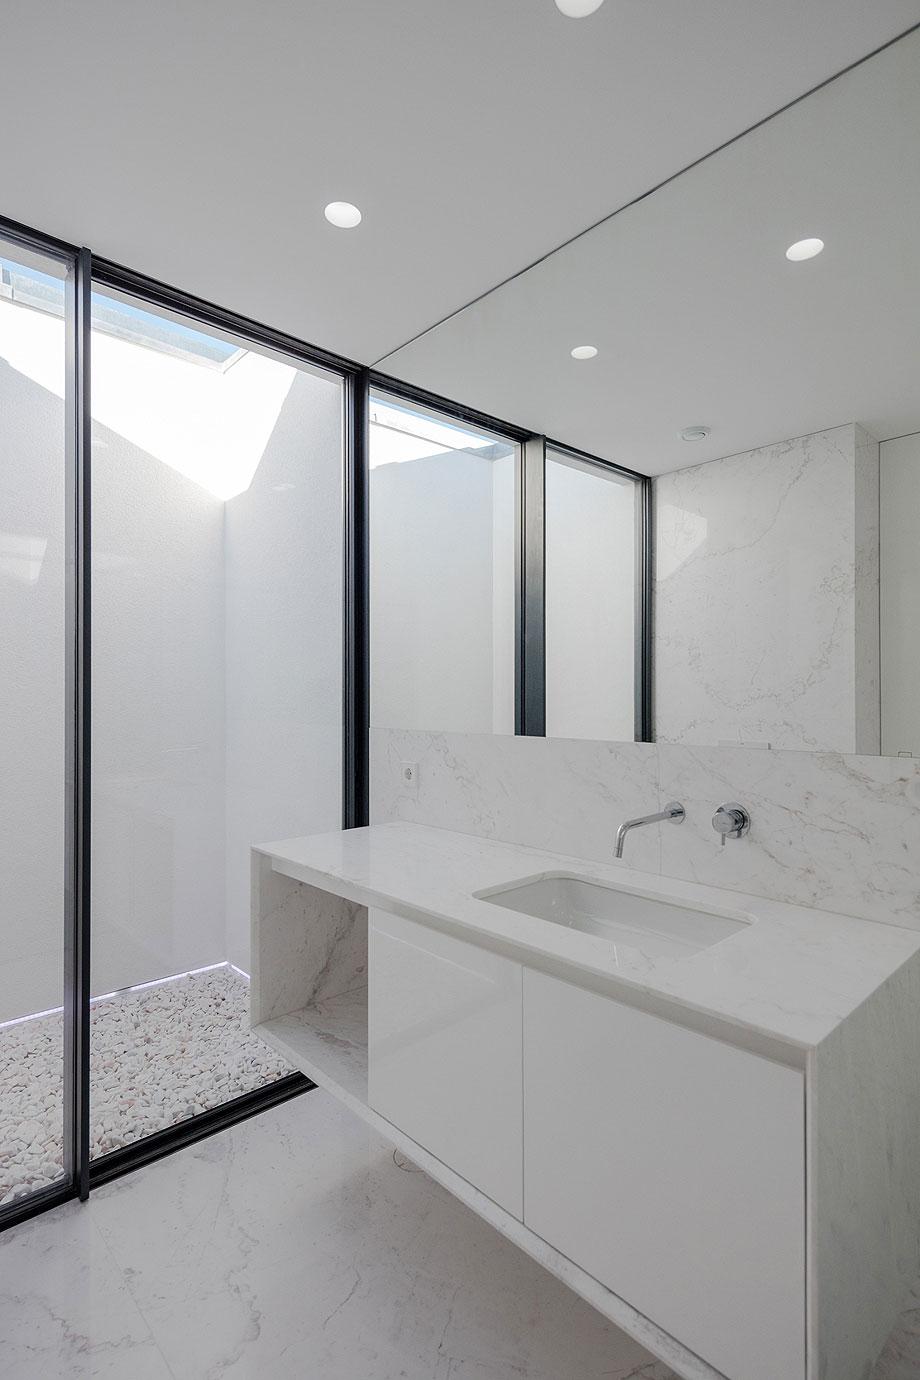 casa-touguinho-III-raulino-silva-arquitecto (9)